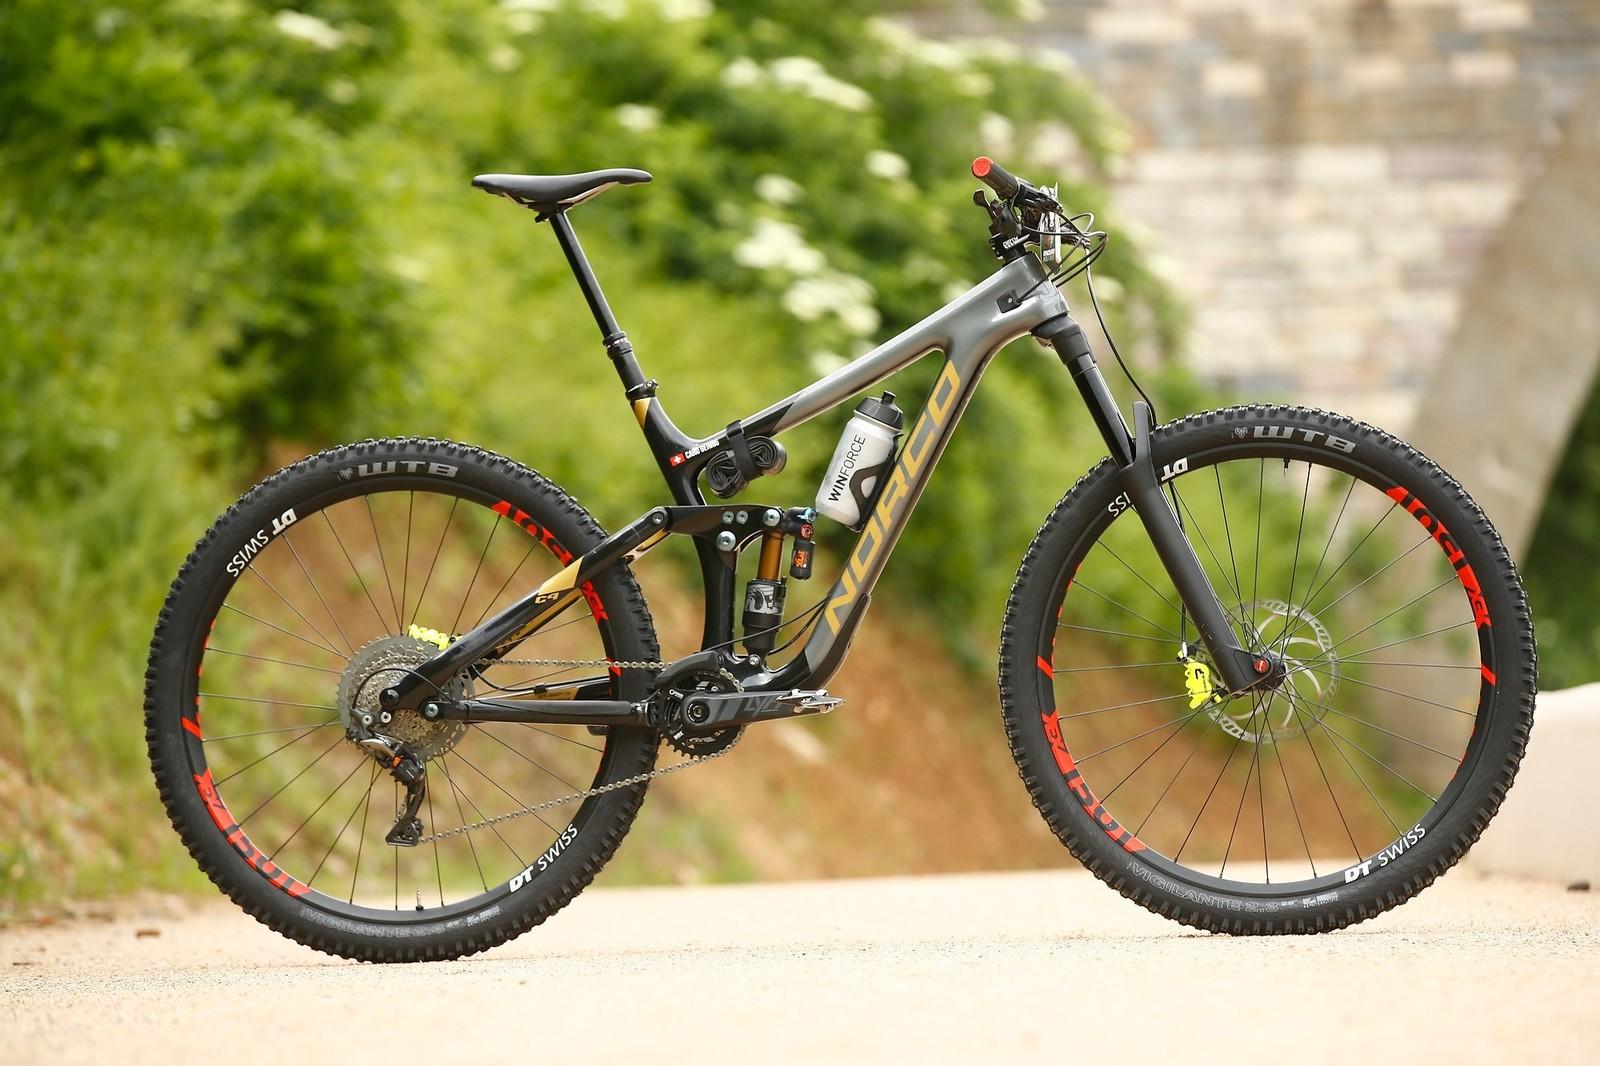 Caro Gehrig's Norco Range 29er - Bike Check: Caro Gehrig's Norco 29er - Mountain Biking Pictures - Vital MTB